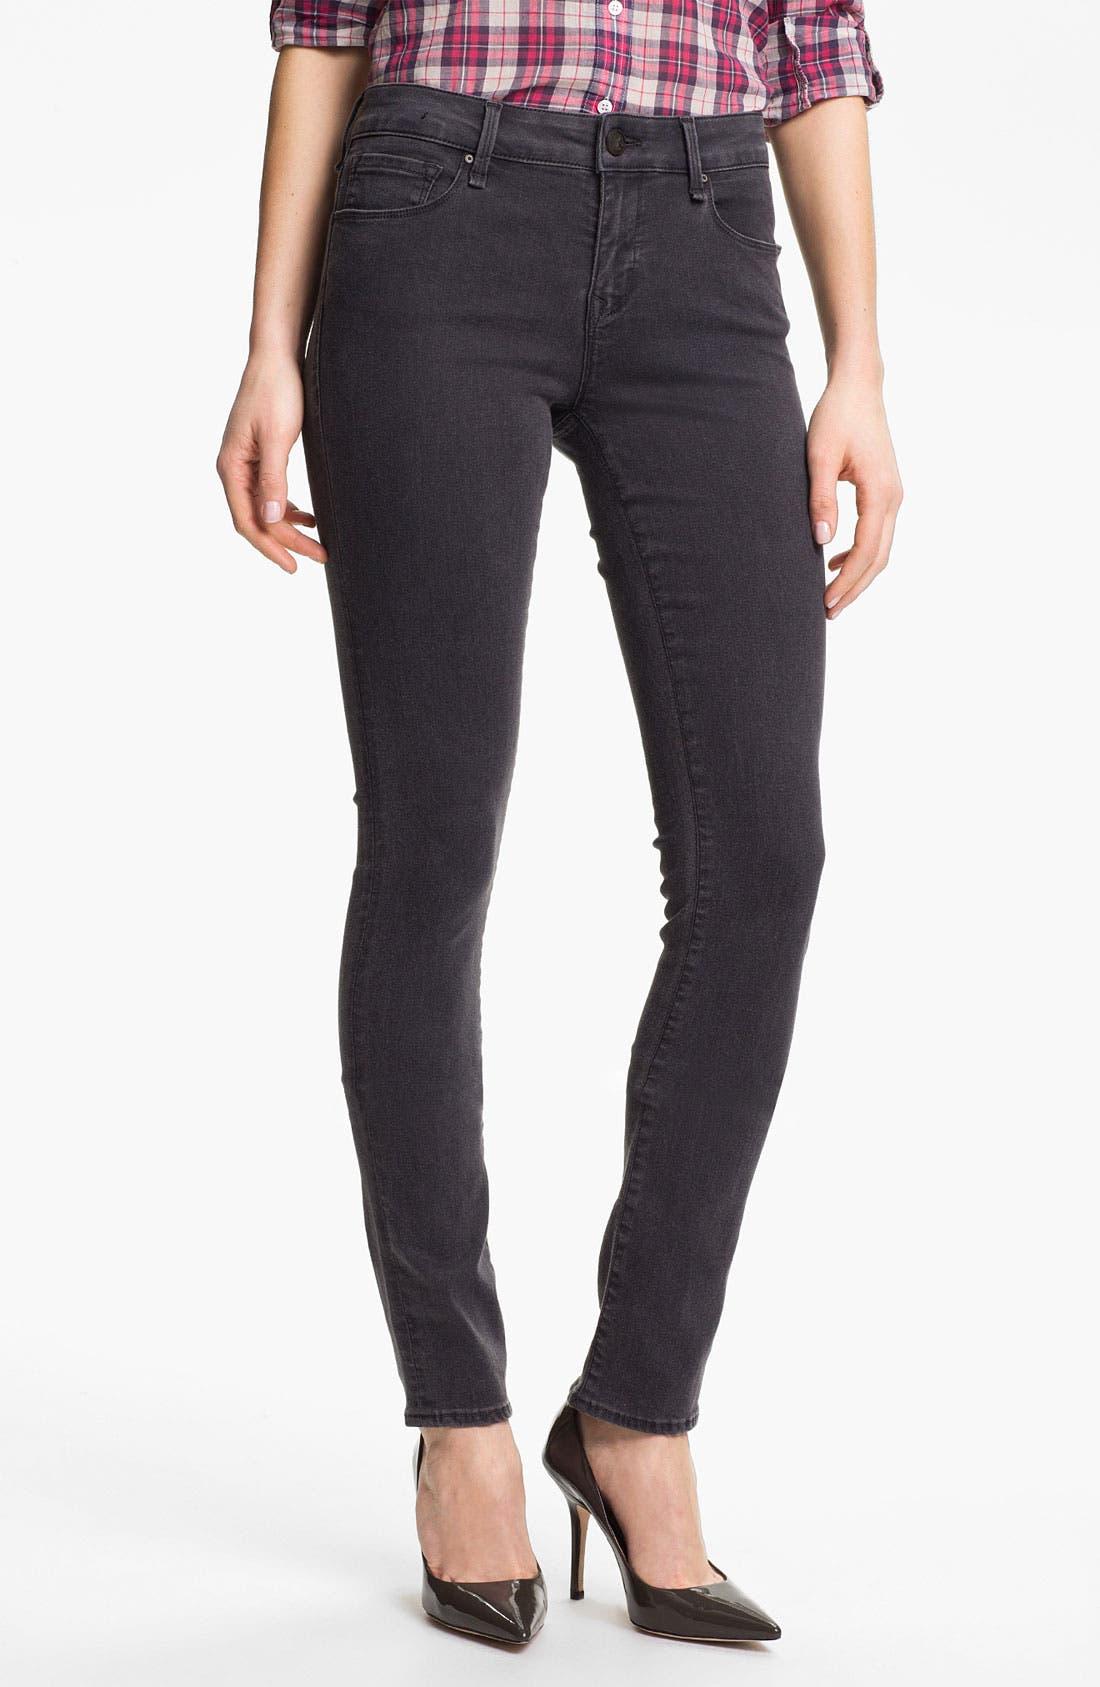 Alternate Image 1 Selected - Mavi Jeans 'Serena' Skinny Jeans (Grey Shanti)